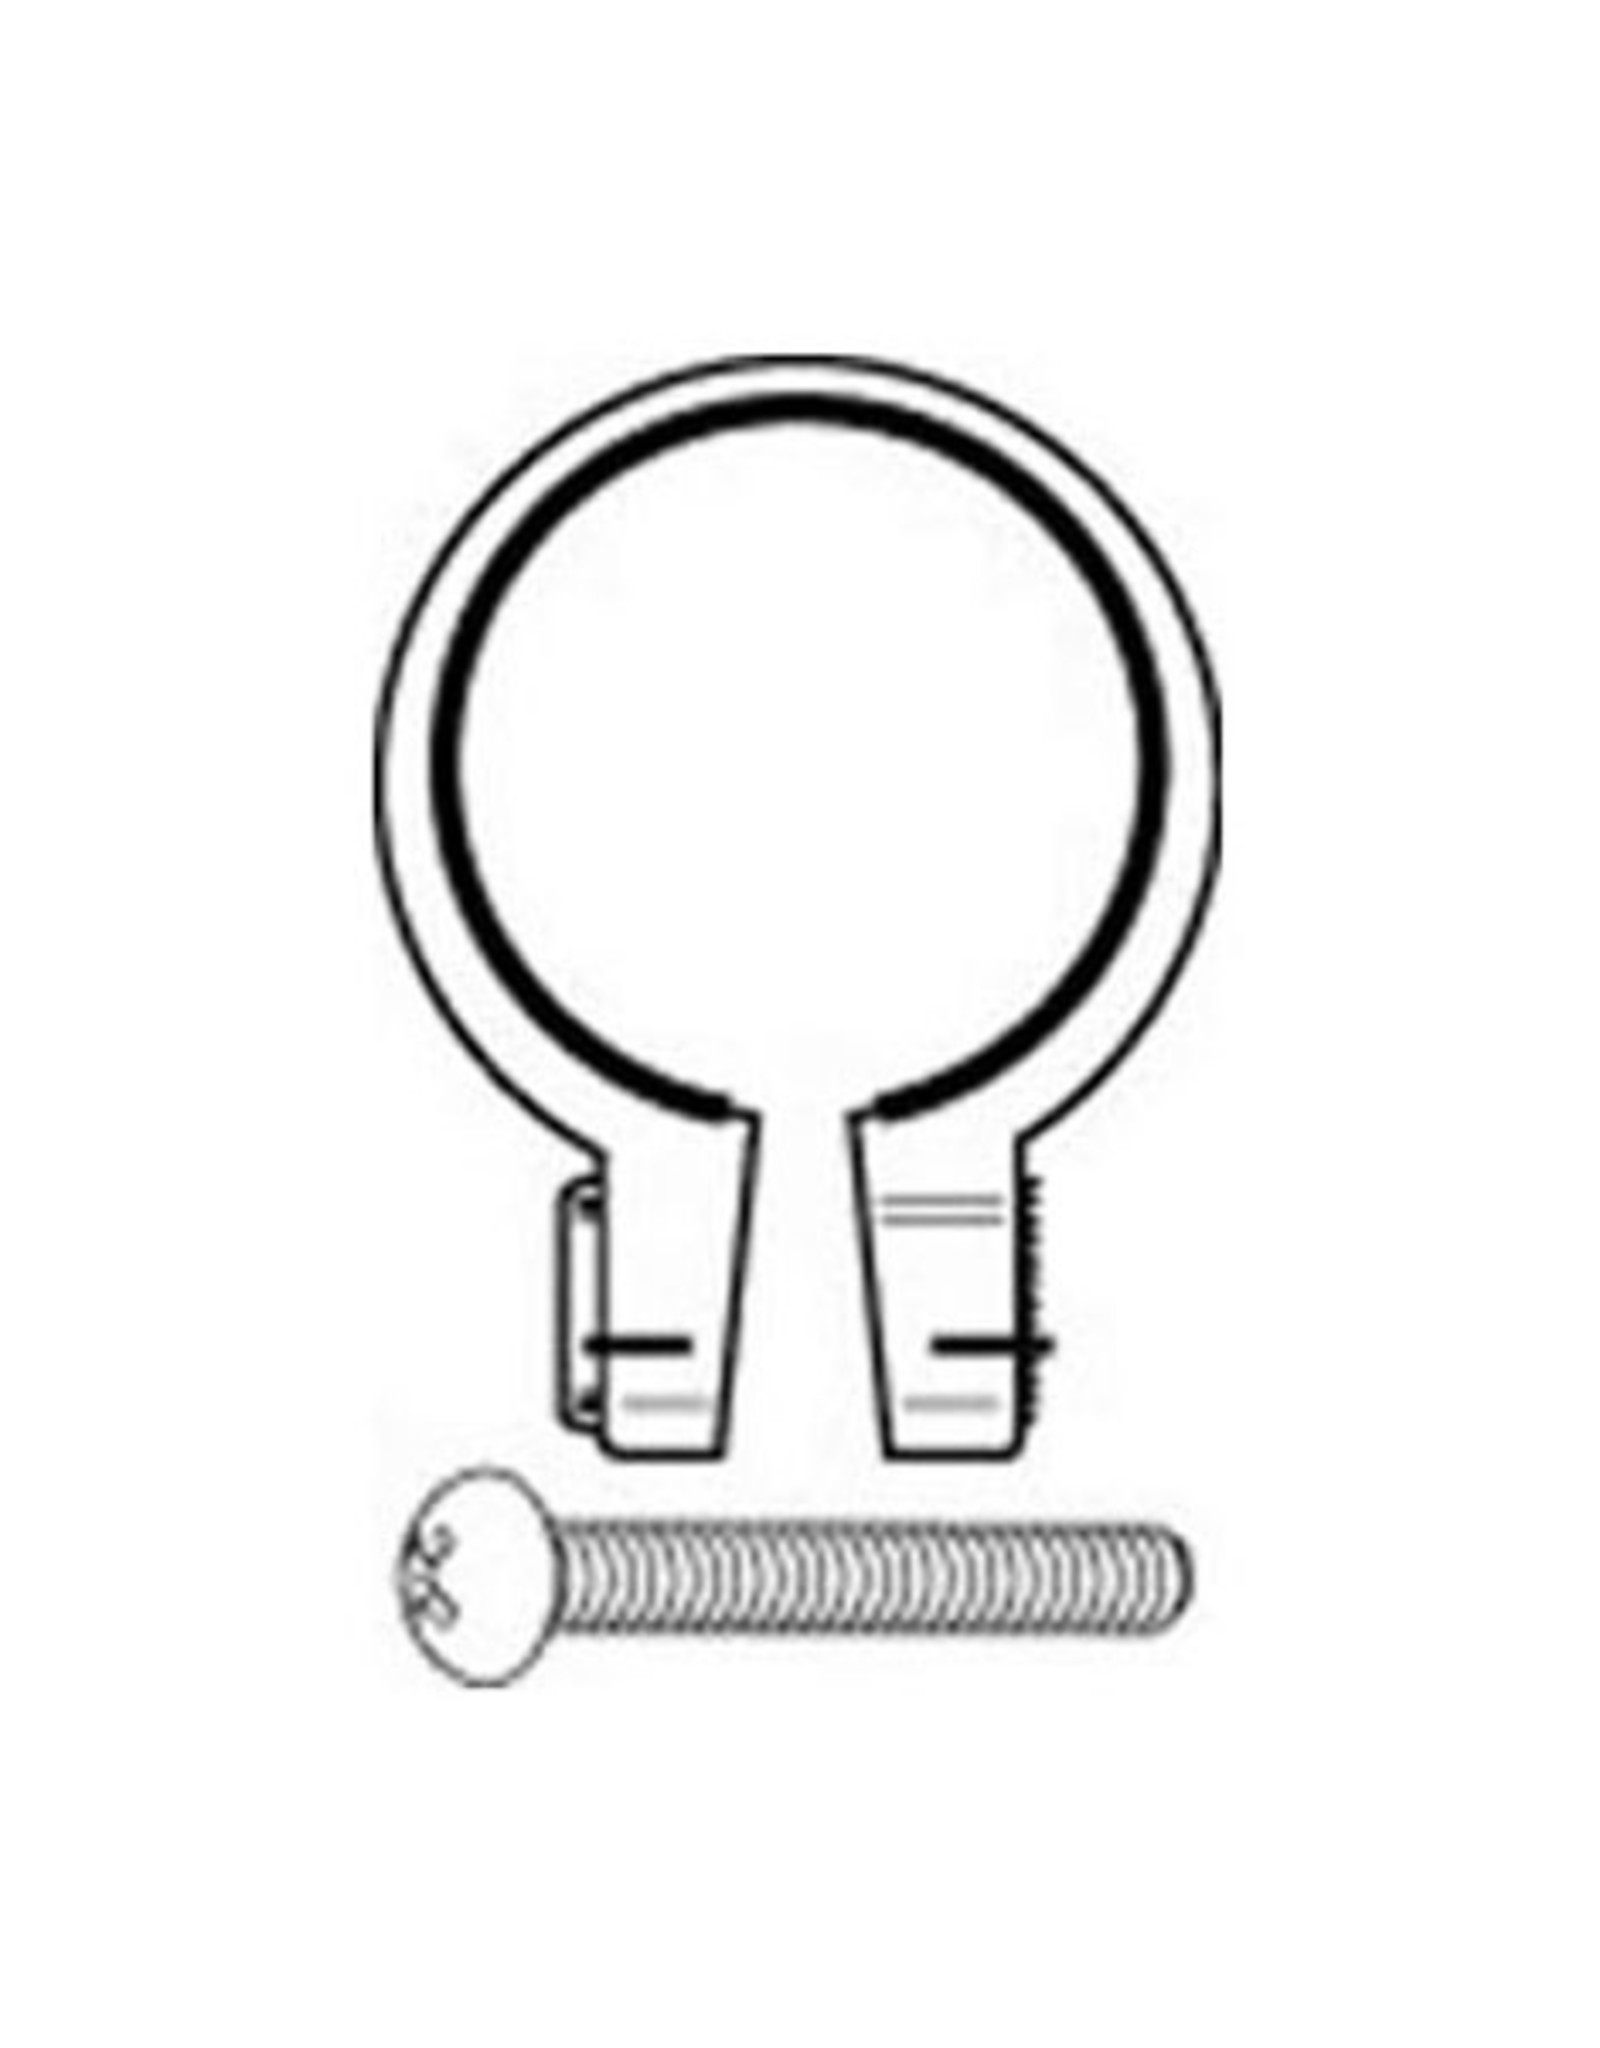 Cateye Light Clamp SP7 28.8-32.5mm